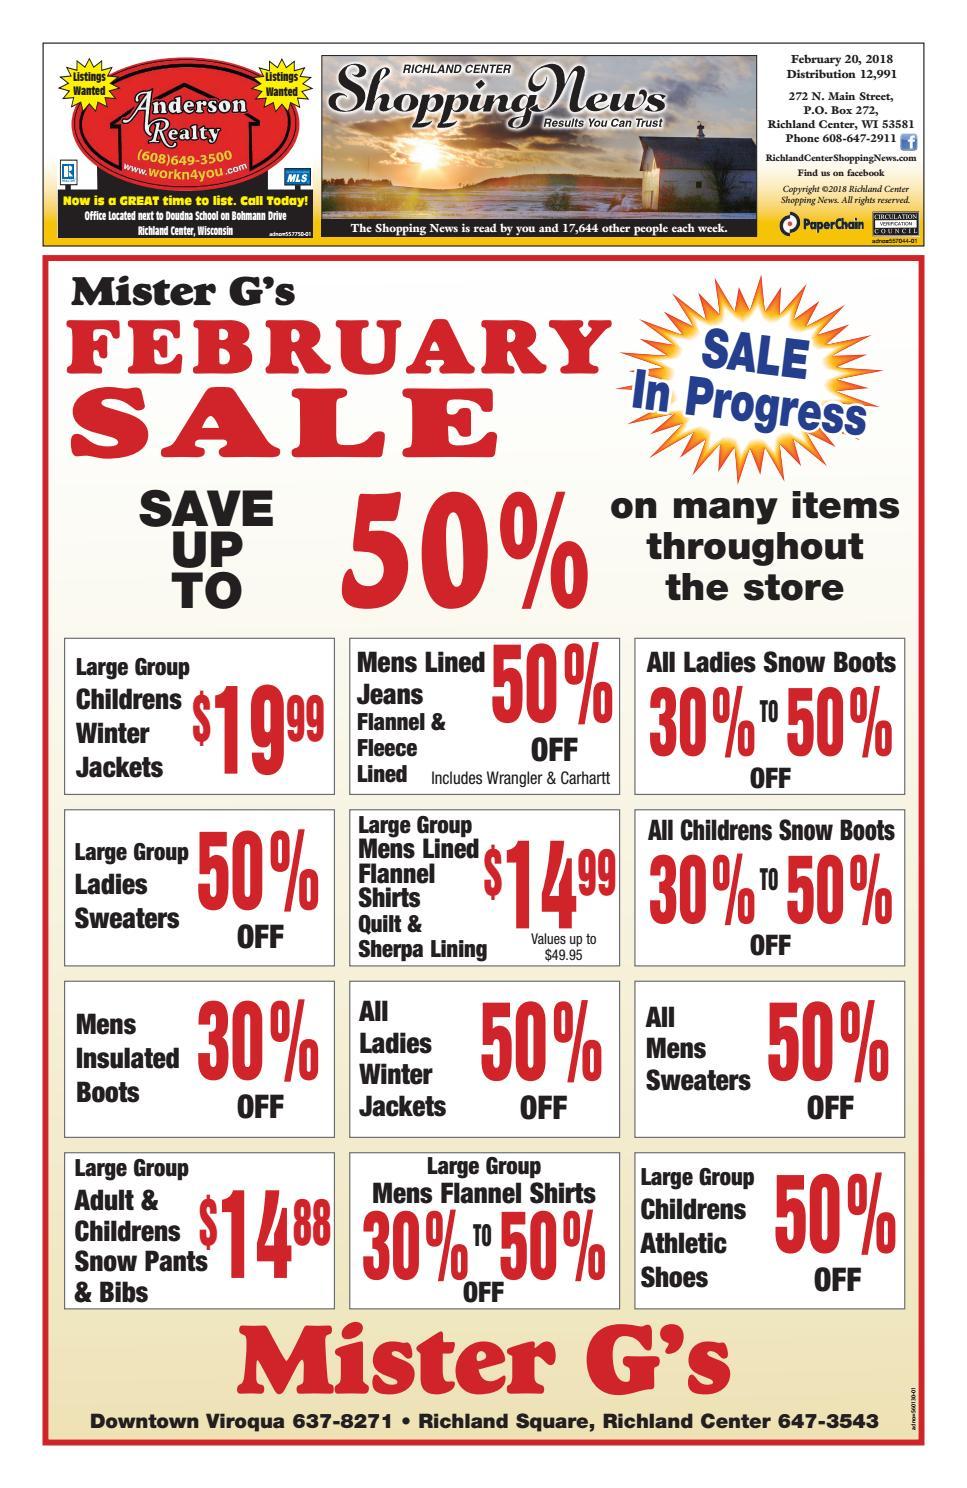 Richland Center Shopping News by Woodward Community Media - issuu